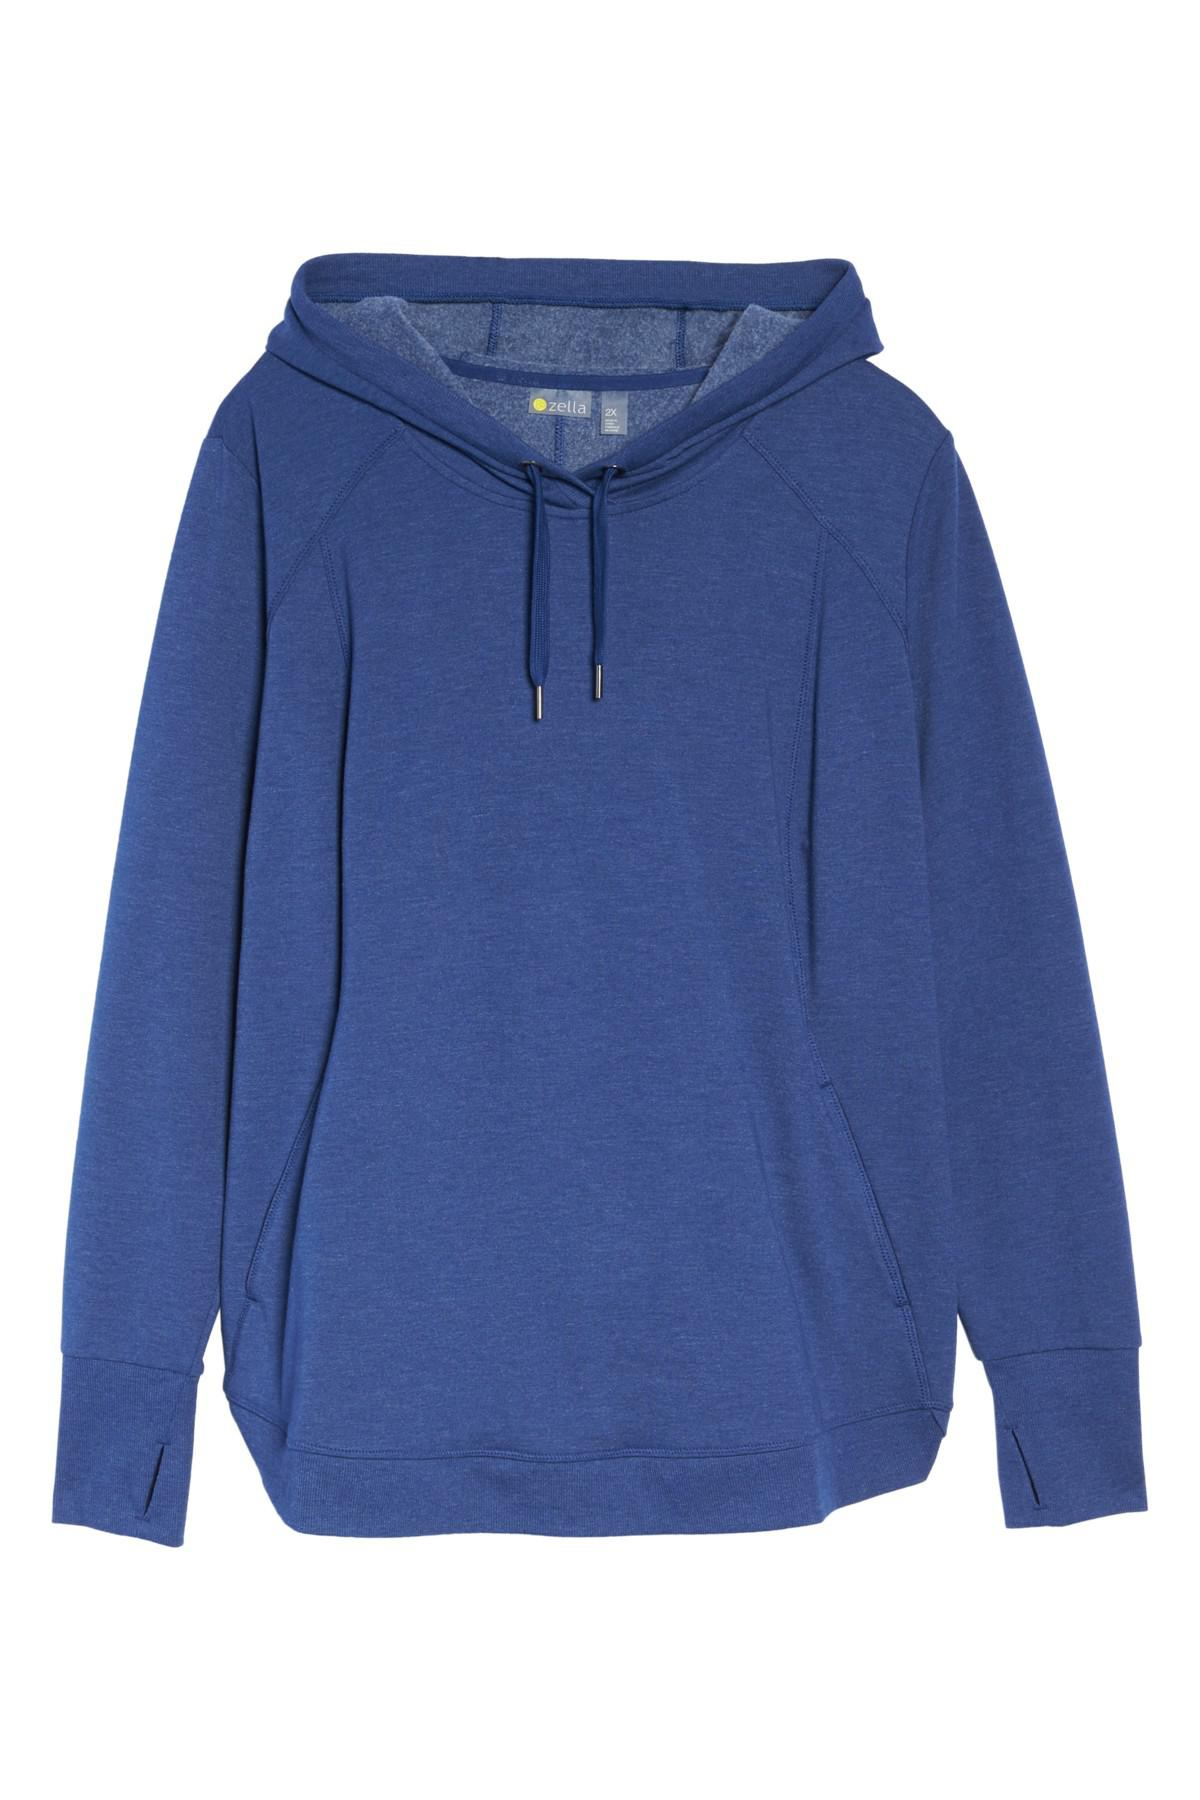 200ae97dc16 Lyst - Zella En Route Pullover Hoodie (plus Size) in Blue